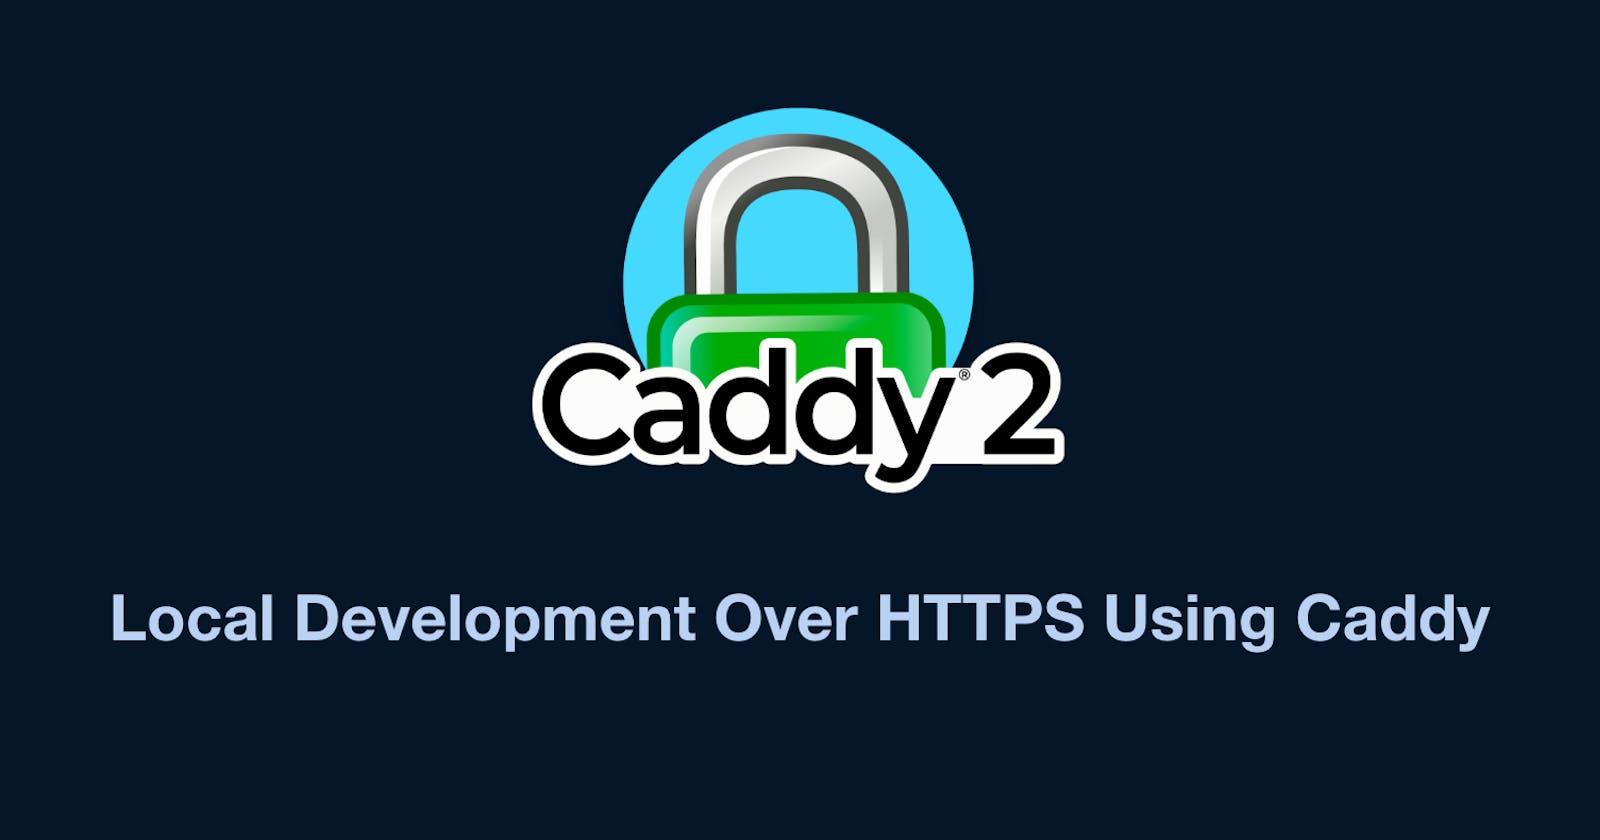 Traditional Setup: Run Local Development Over HTTPS Using Caddy